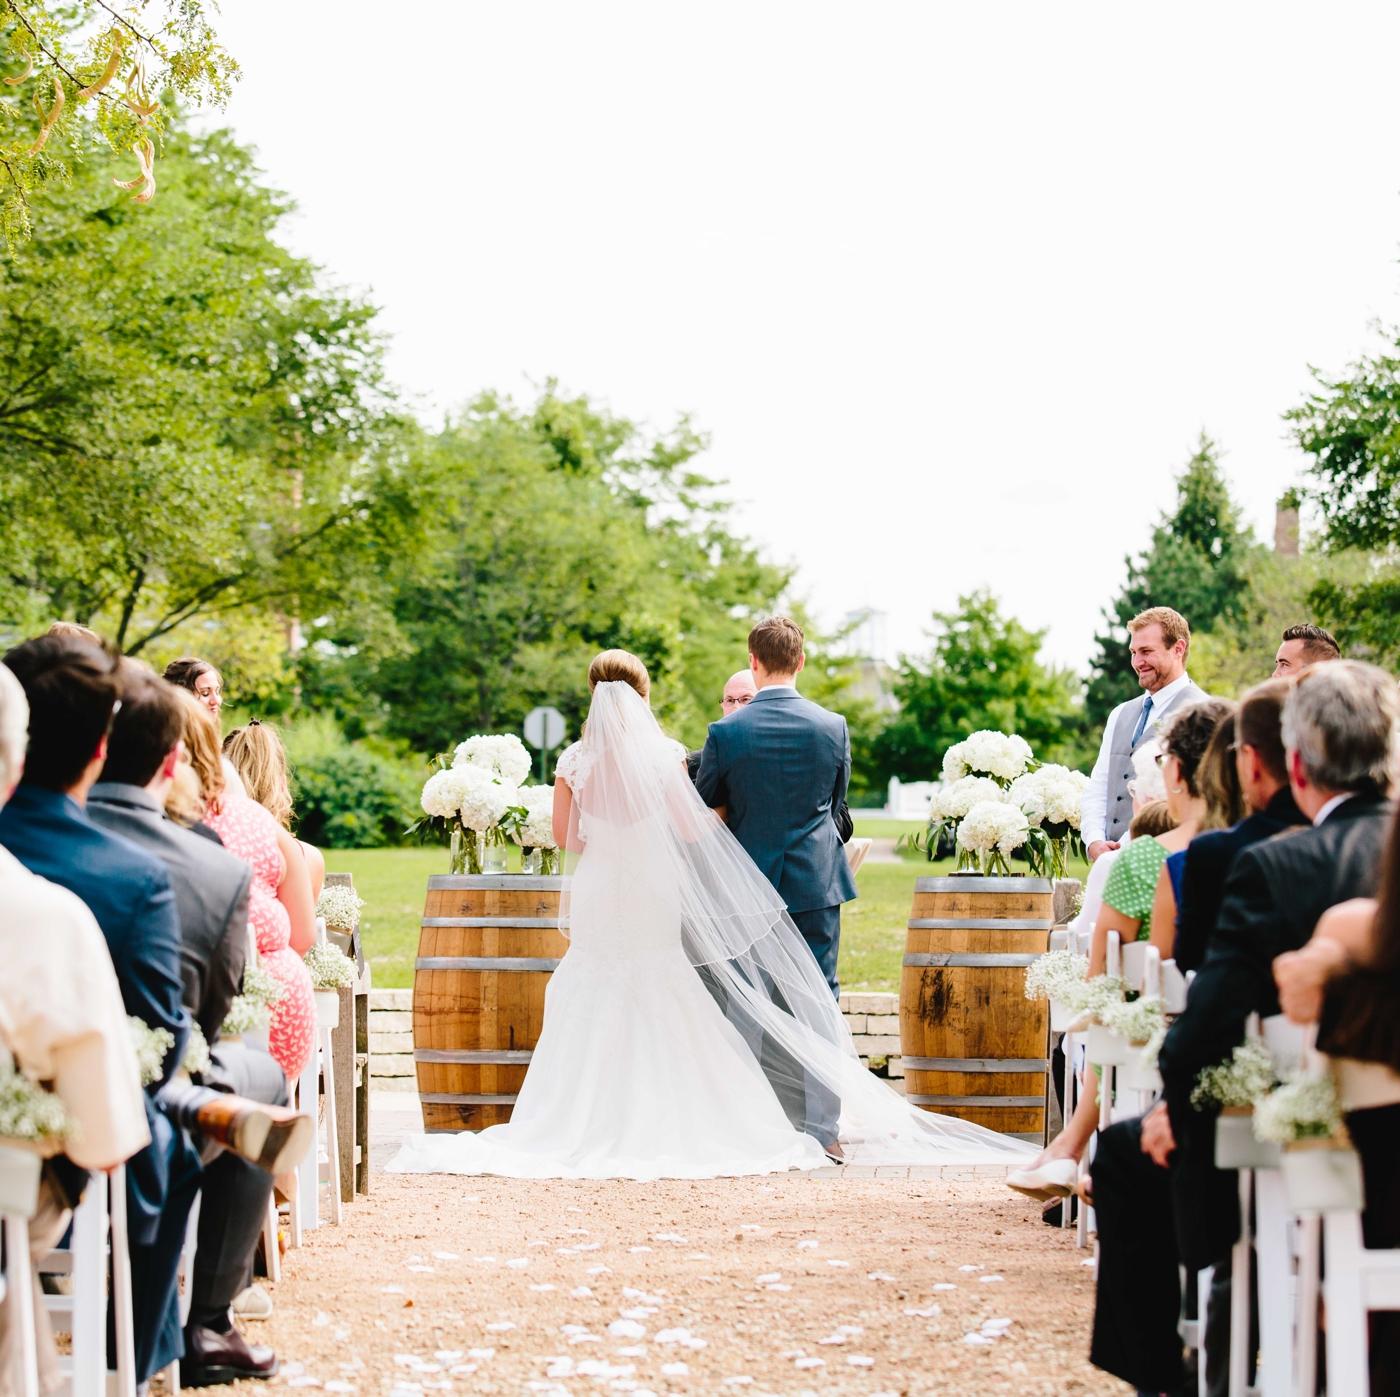 chicago-fine-art-wedding-photography-chiapetta28